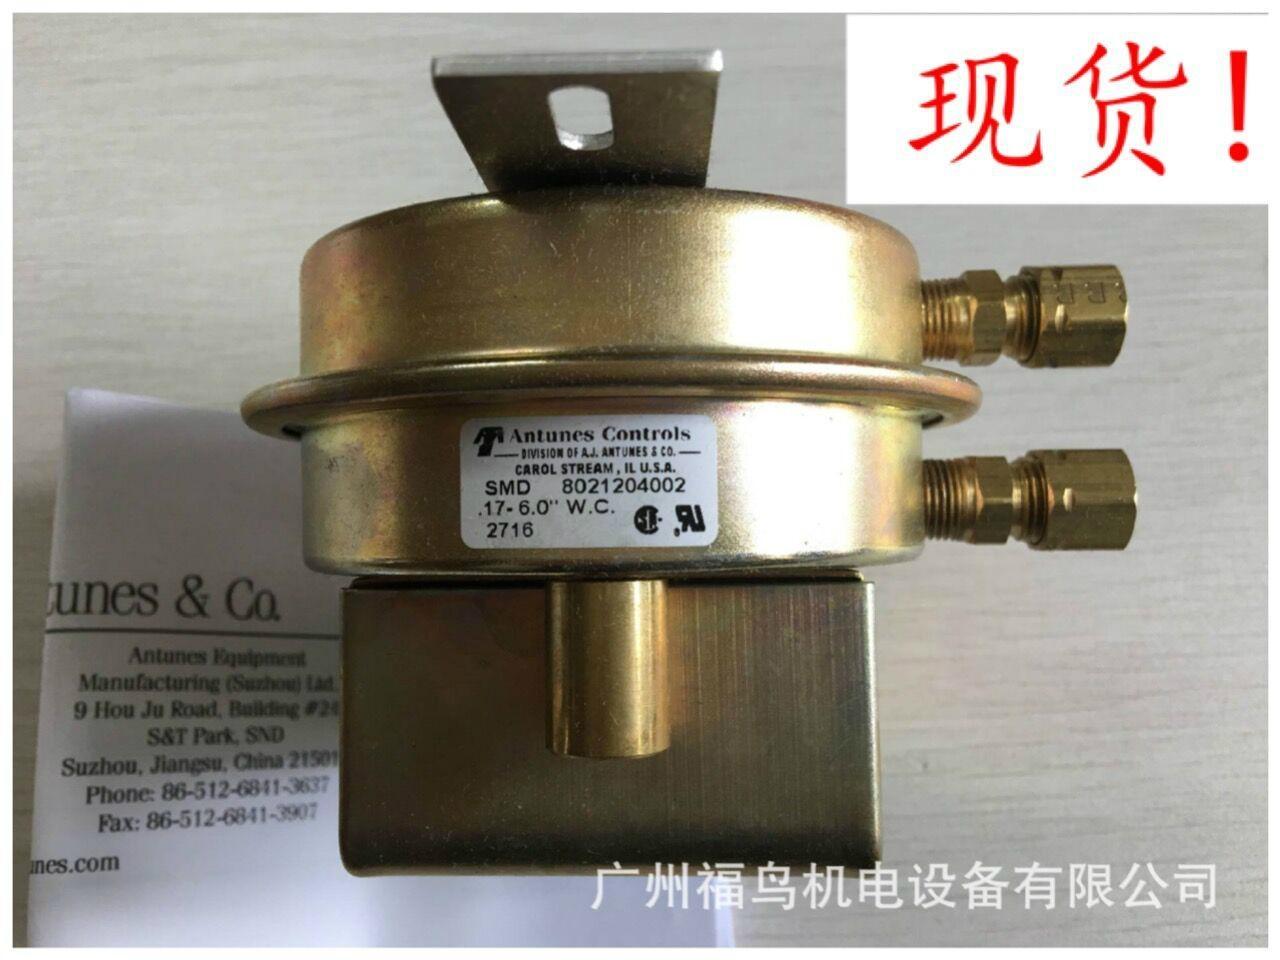 ANTUNES CONTROLS压力开关,型号: SMD(8021204002)